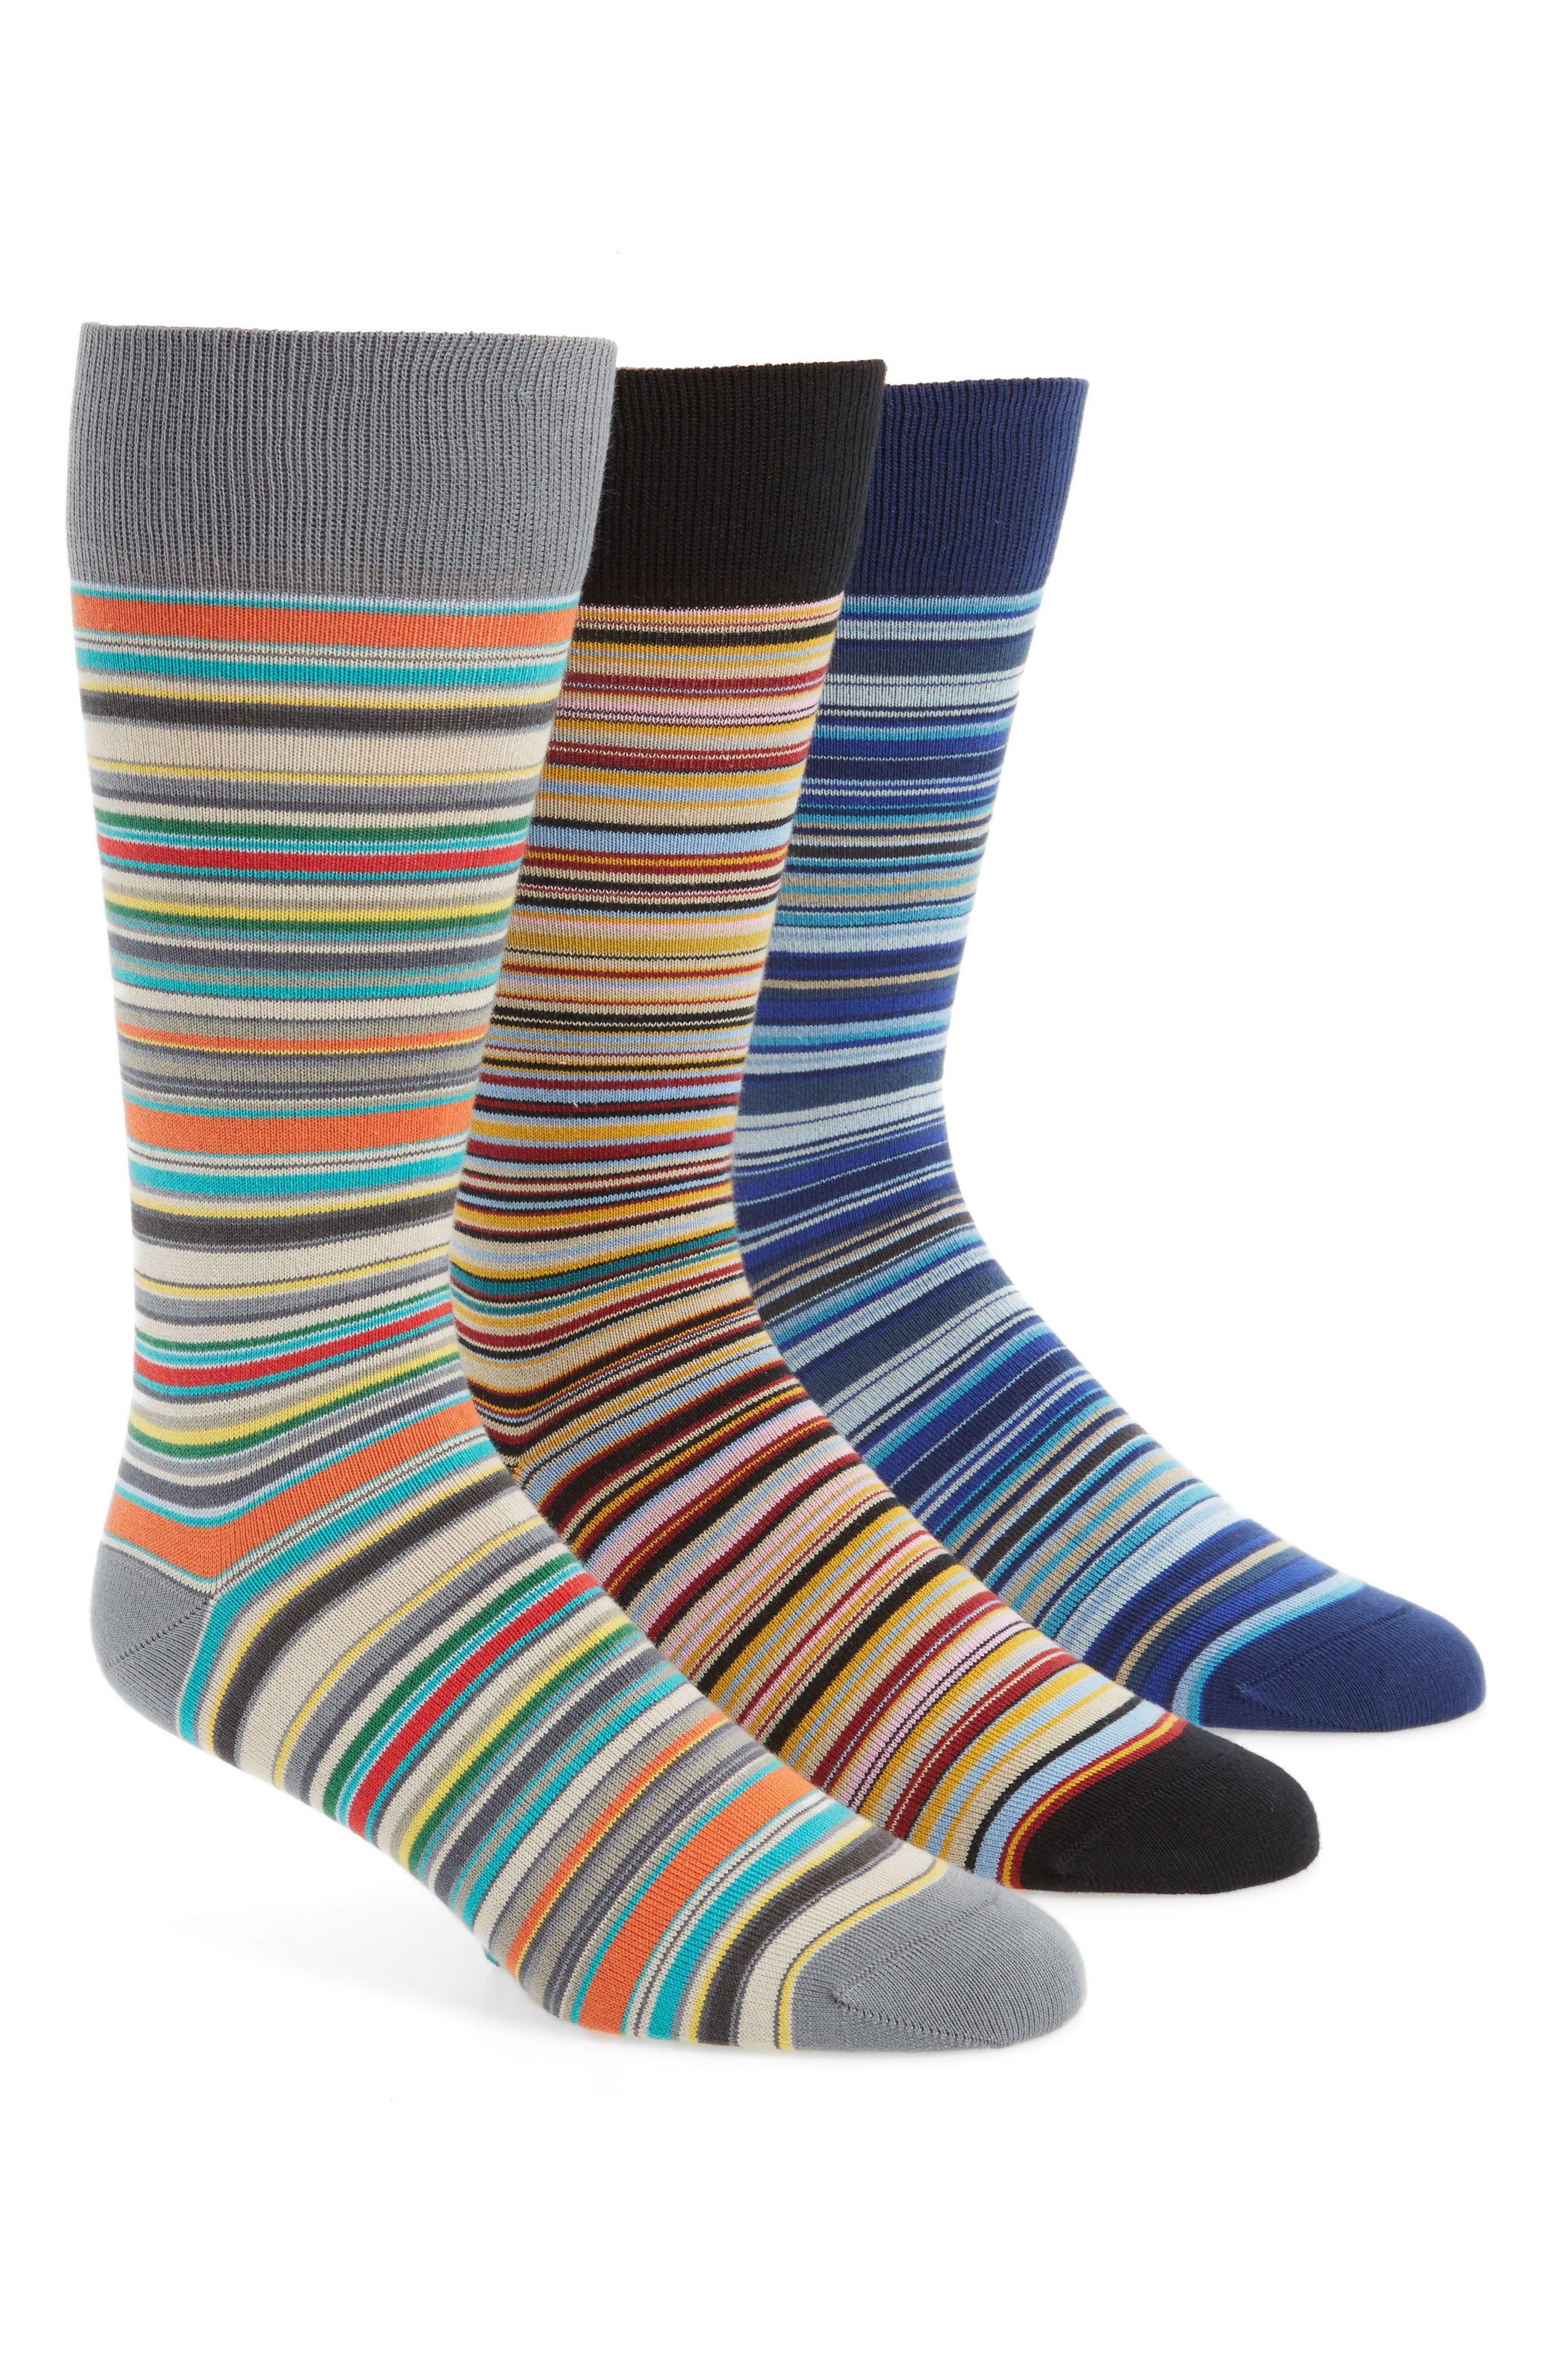 Main Image - Paul Smith 3-Pack Mixed Pattern Socks ($90 Value)